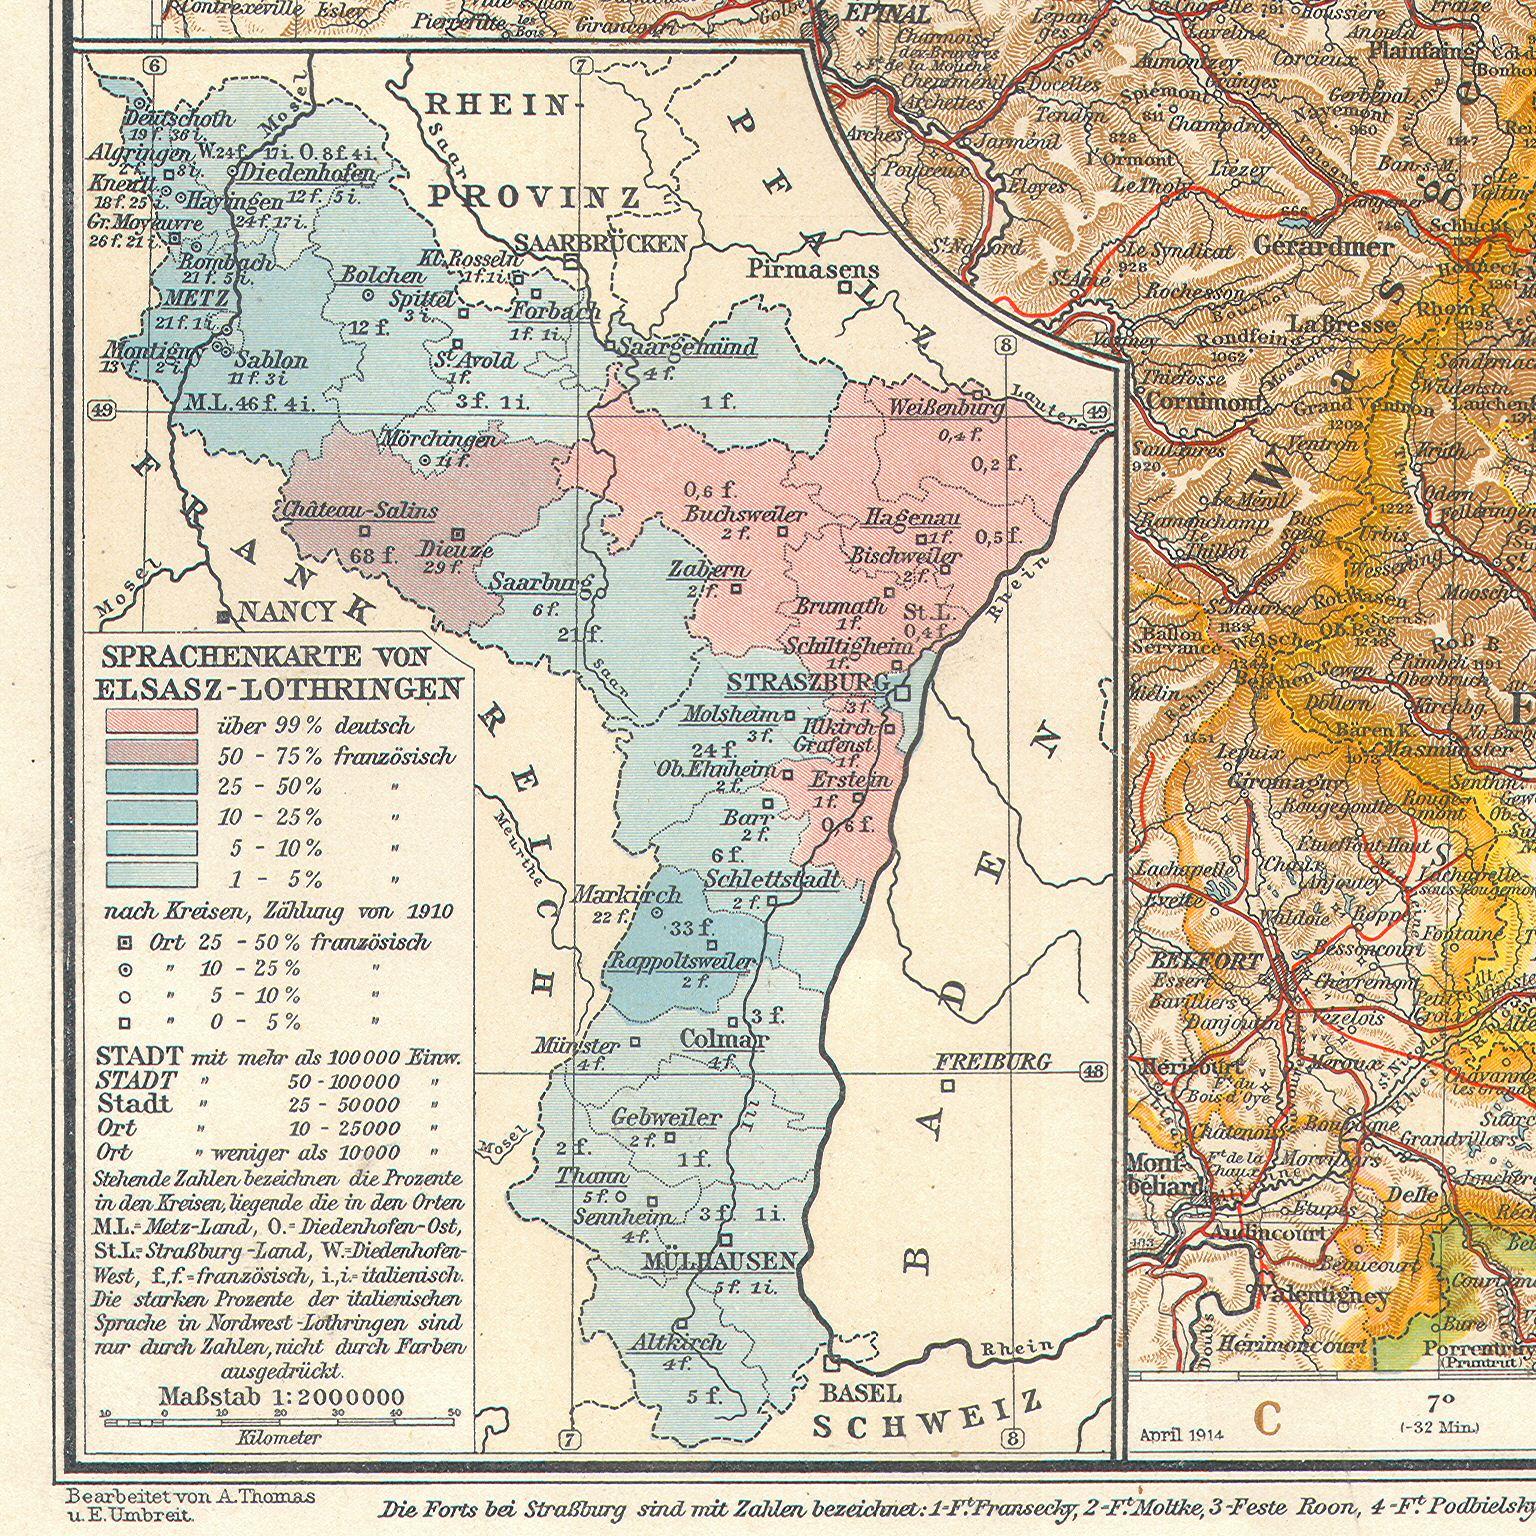 Kroft Family Ancestry: Kroft/Croft, Peter 1811-1901